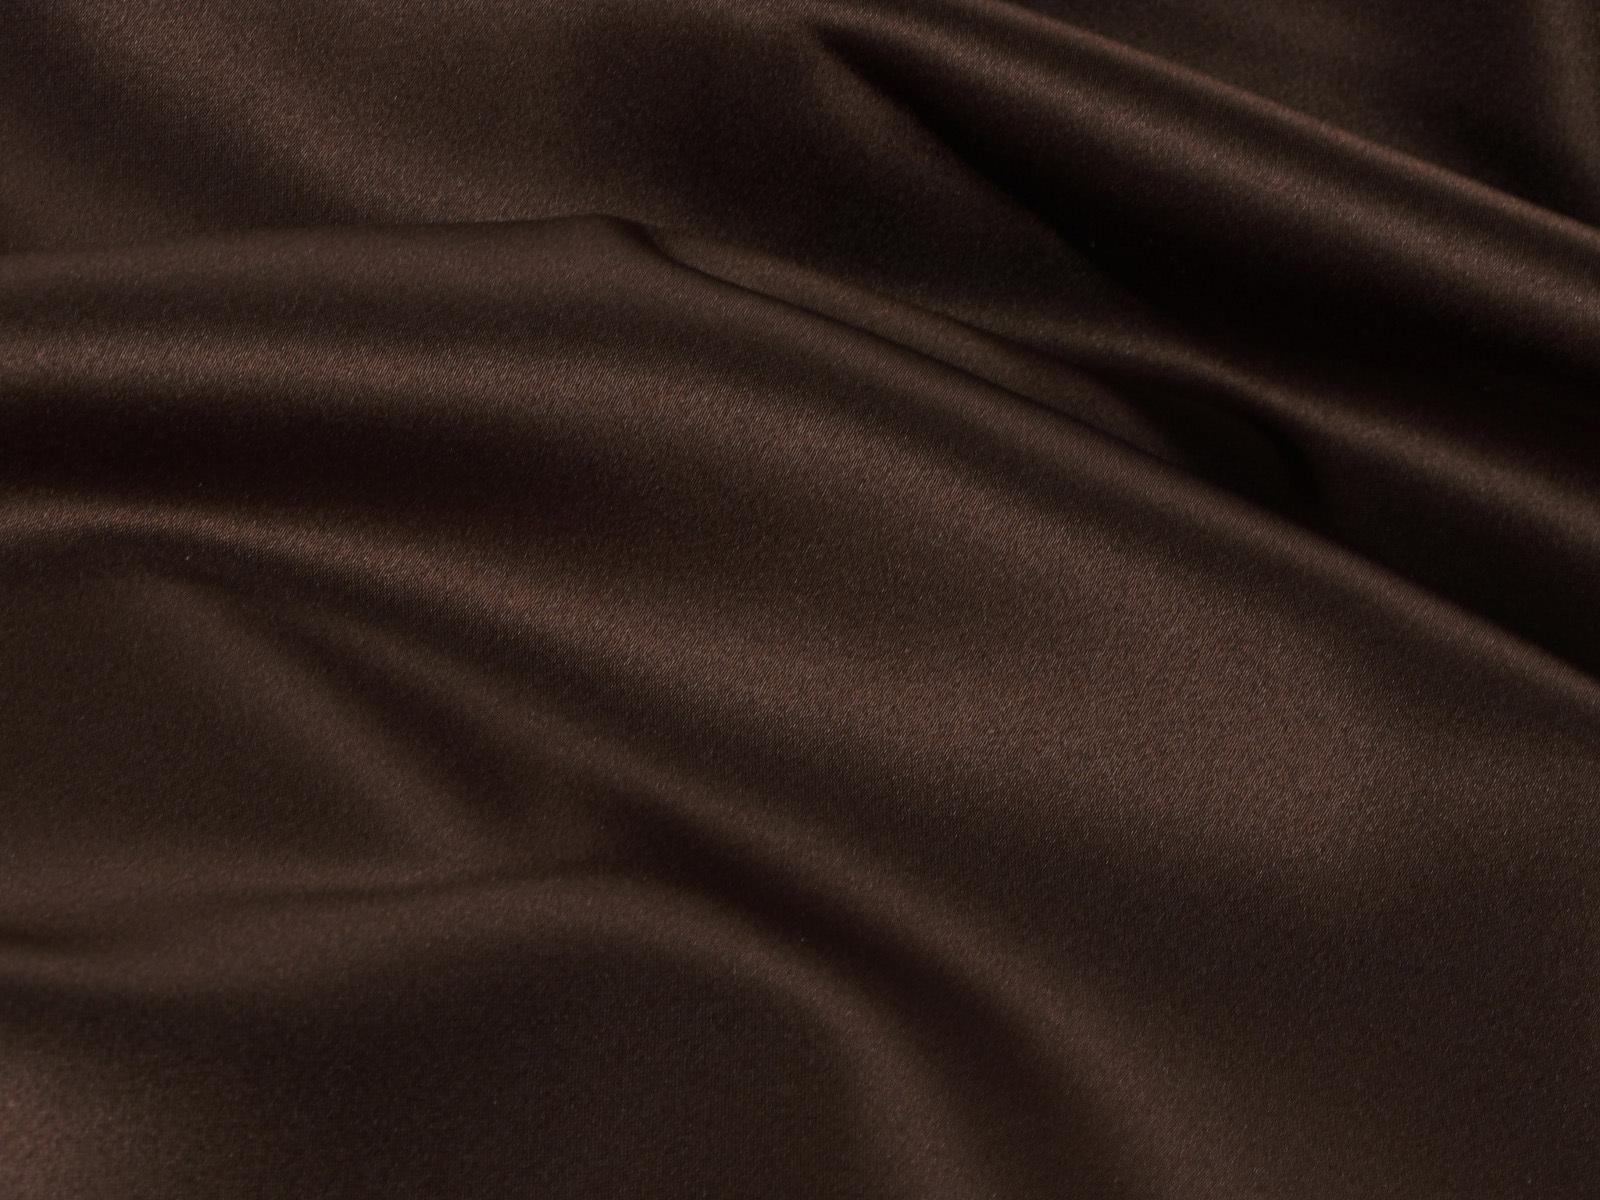 Длинные шторы. Classic Blackout (Dark Brown). Однотонный блэкаут